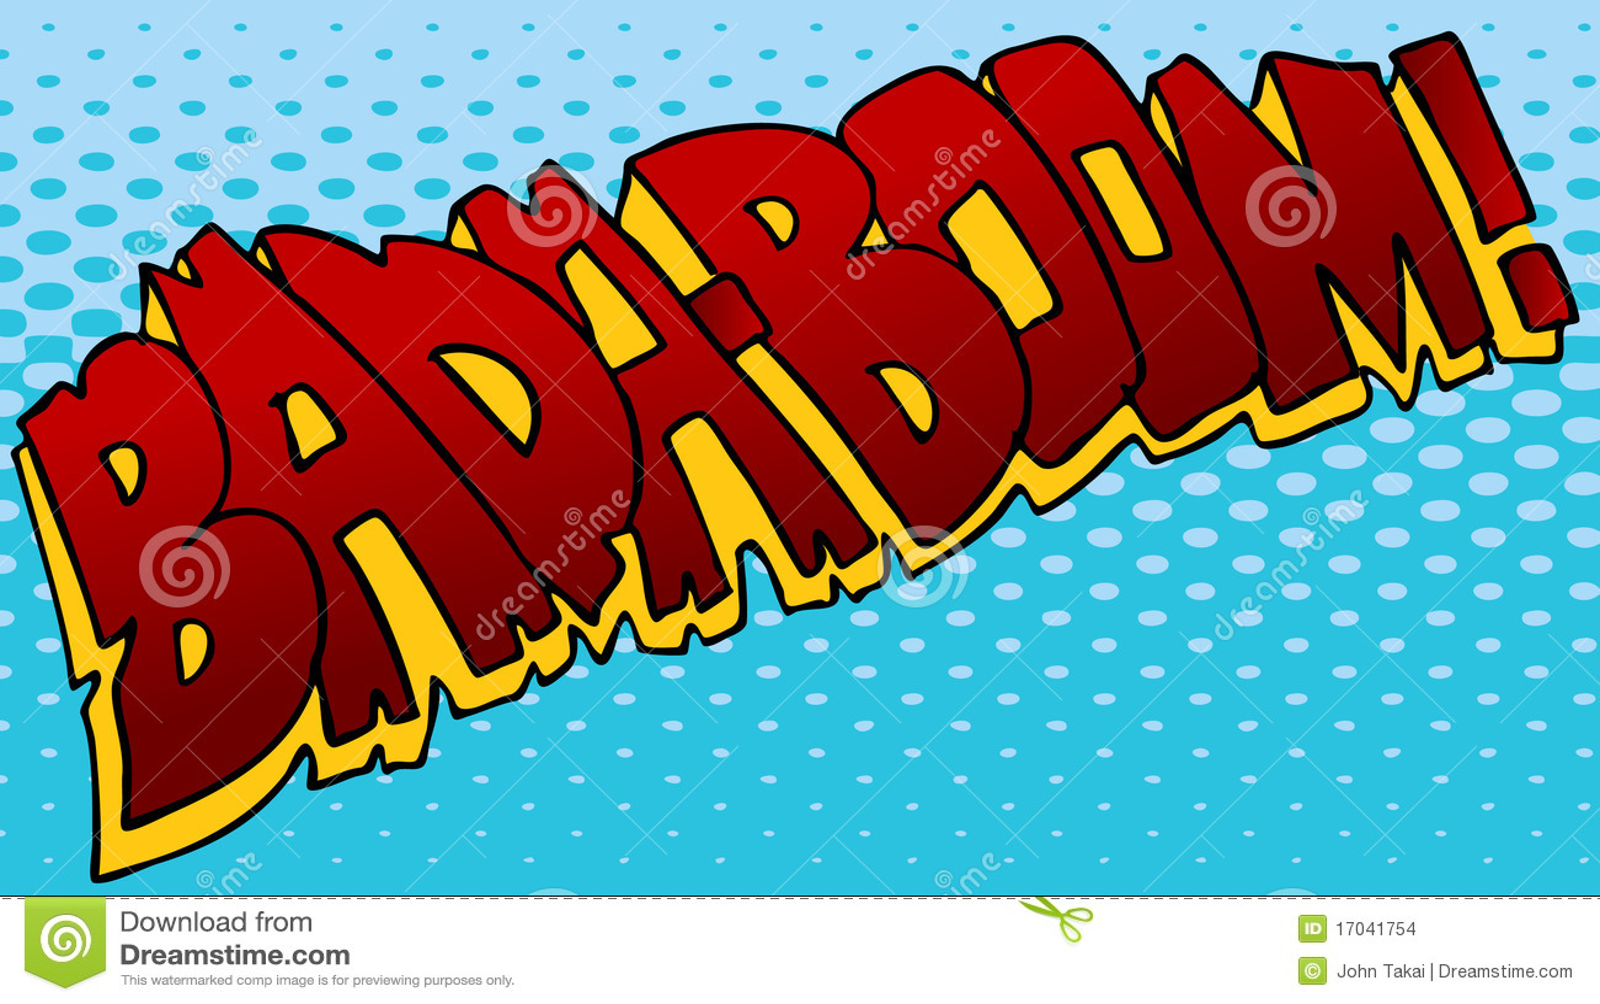 Badaboom Sound Effect Stock Images - Image: 17041754